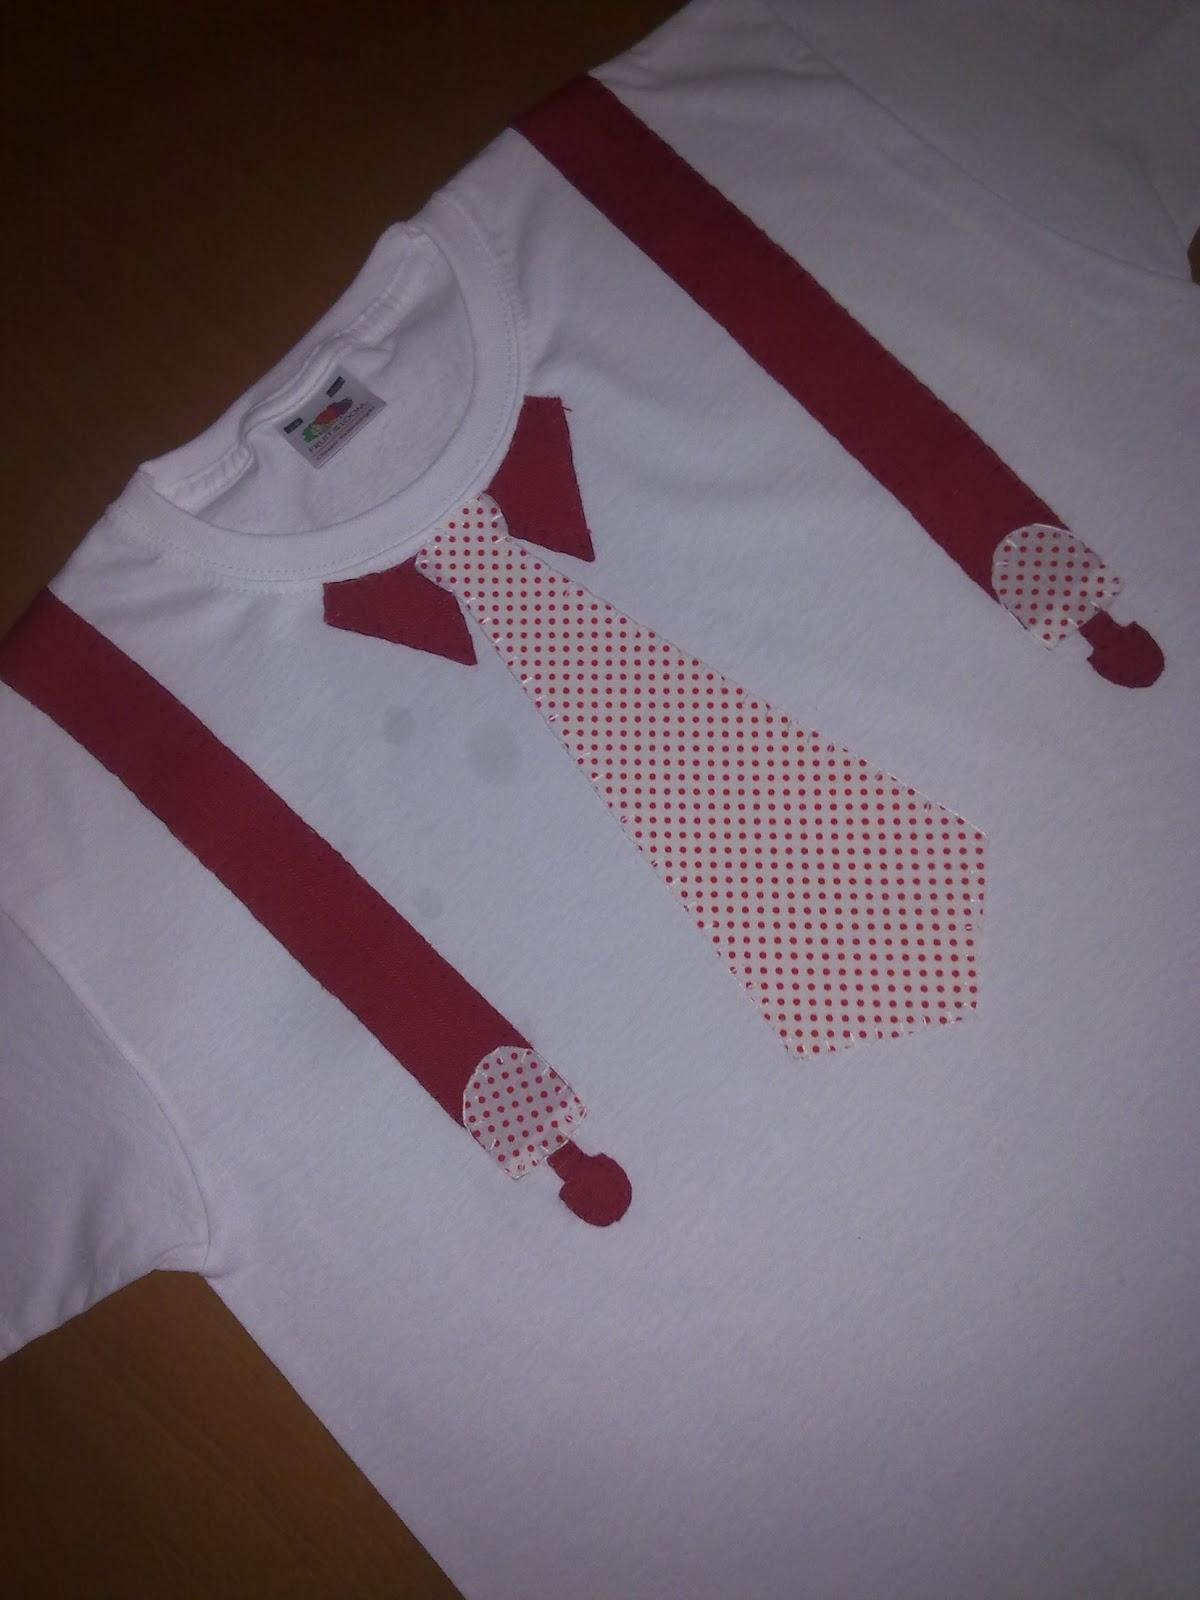 Camiseta de niño hecha a mano con  detalle de corbata y tirantes